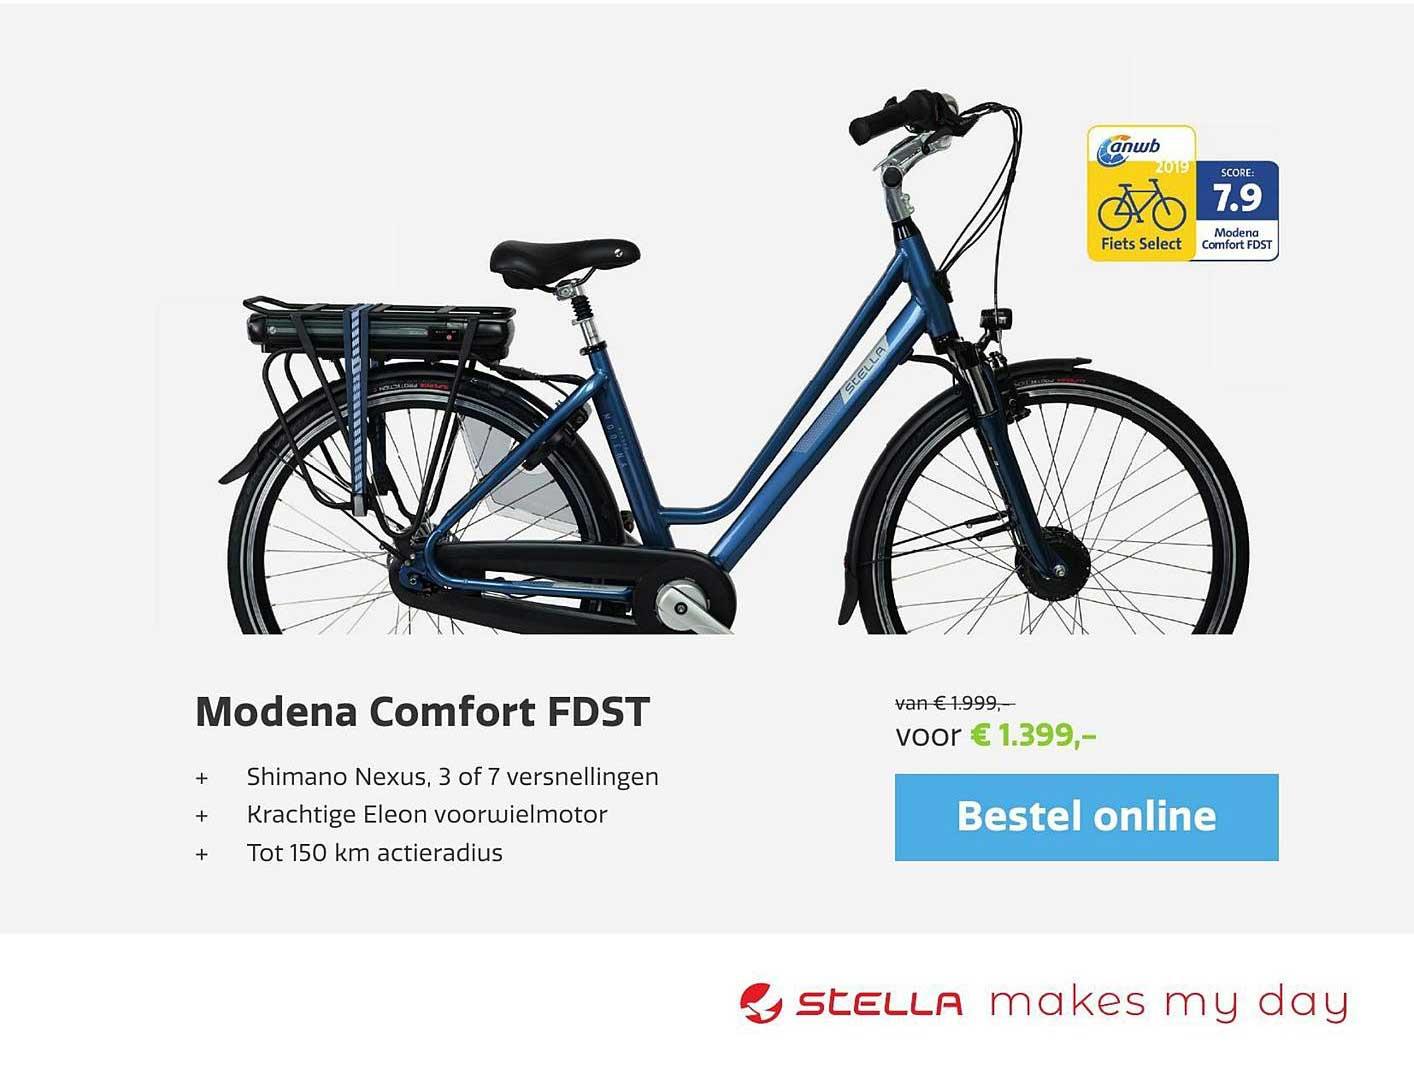 Stella Fietsen Modena Comfort FDST